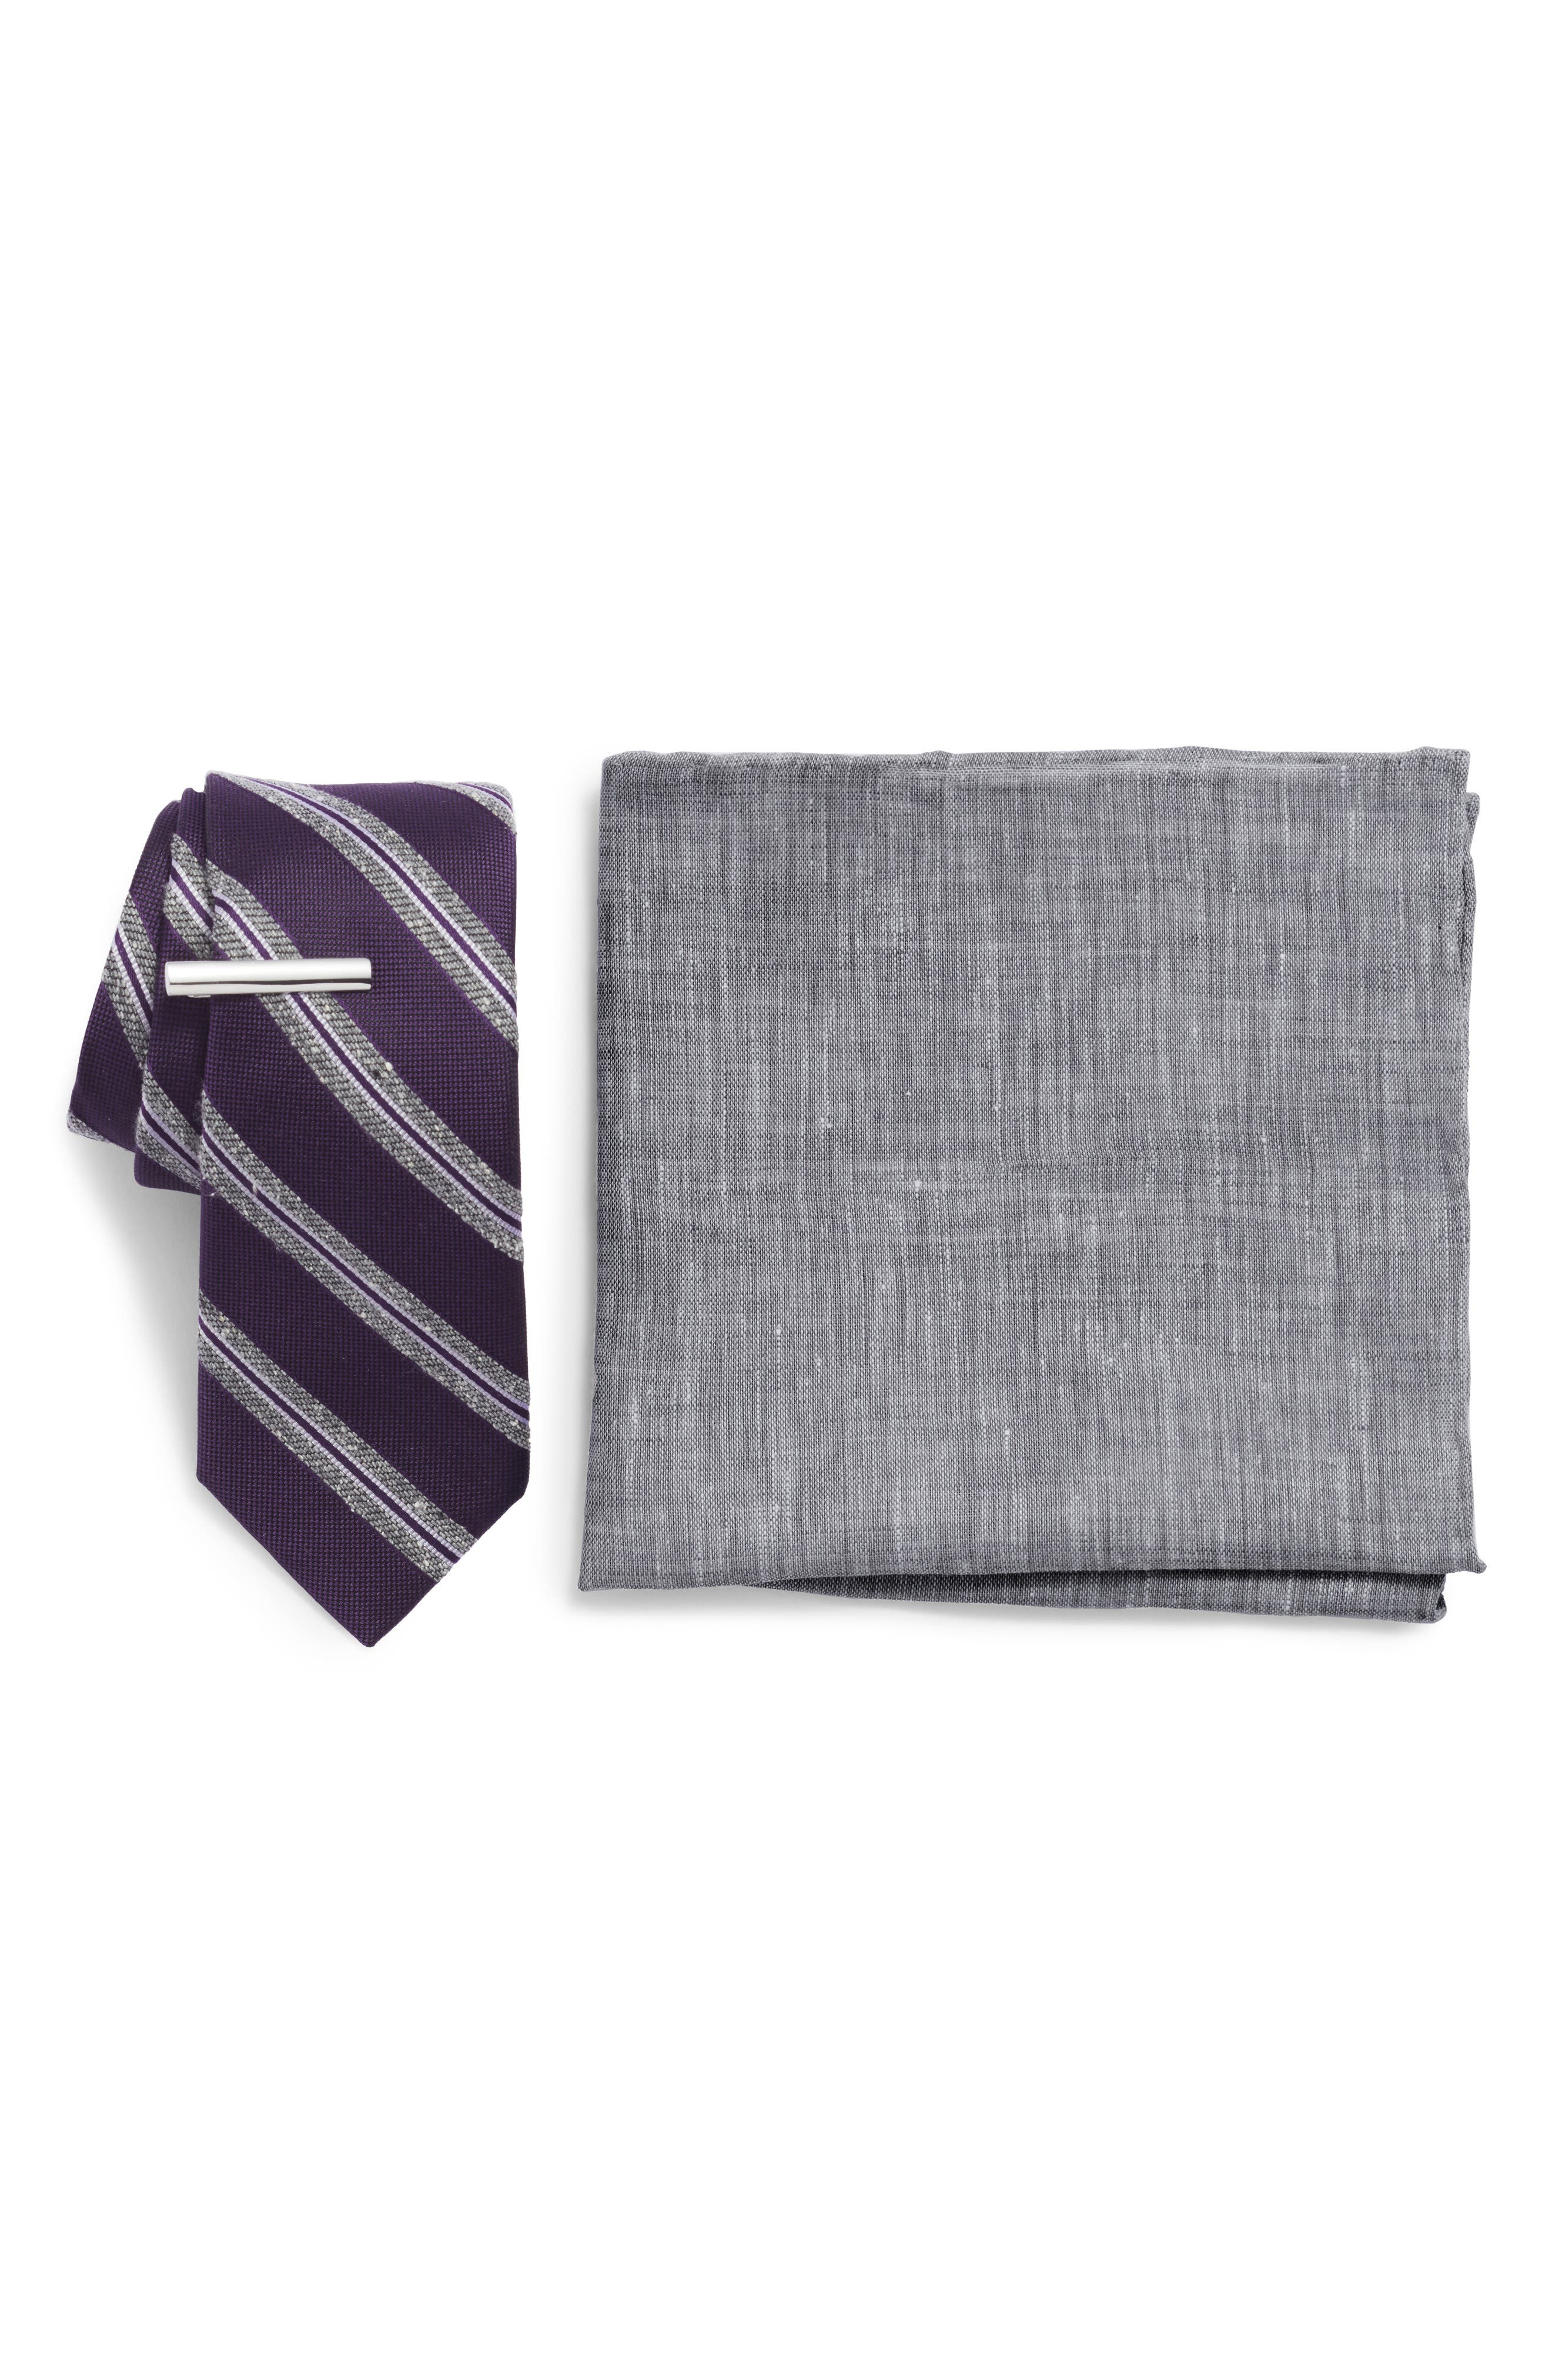 THE TIE BAR Edison Stripe 3-Piece Skinny Tie Style Box, Main, color, EGGPLANT